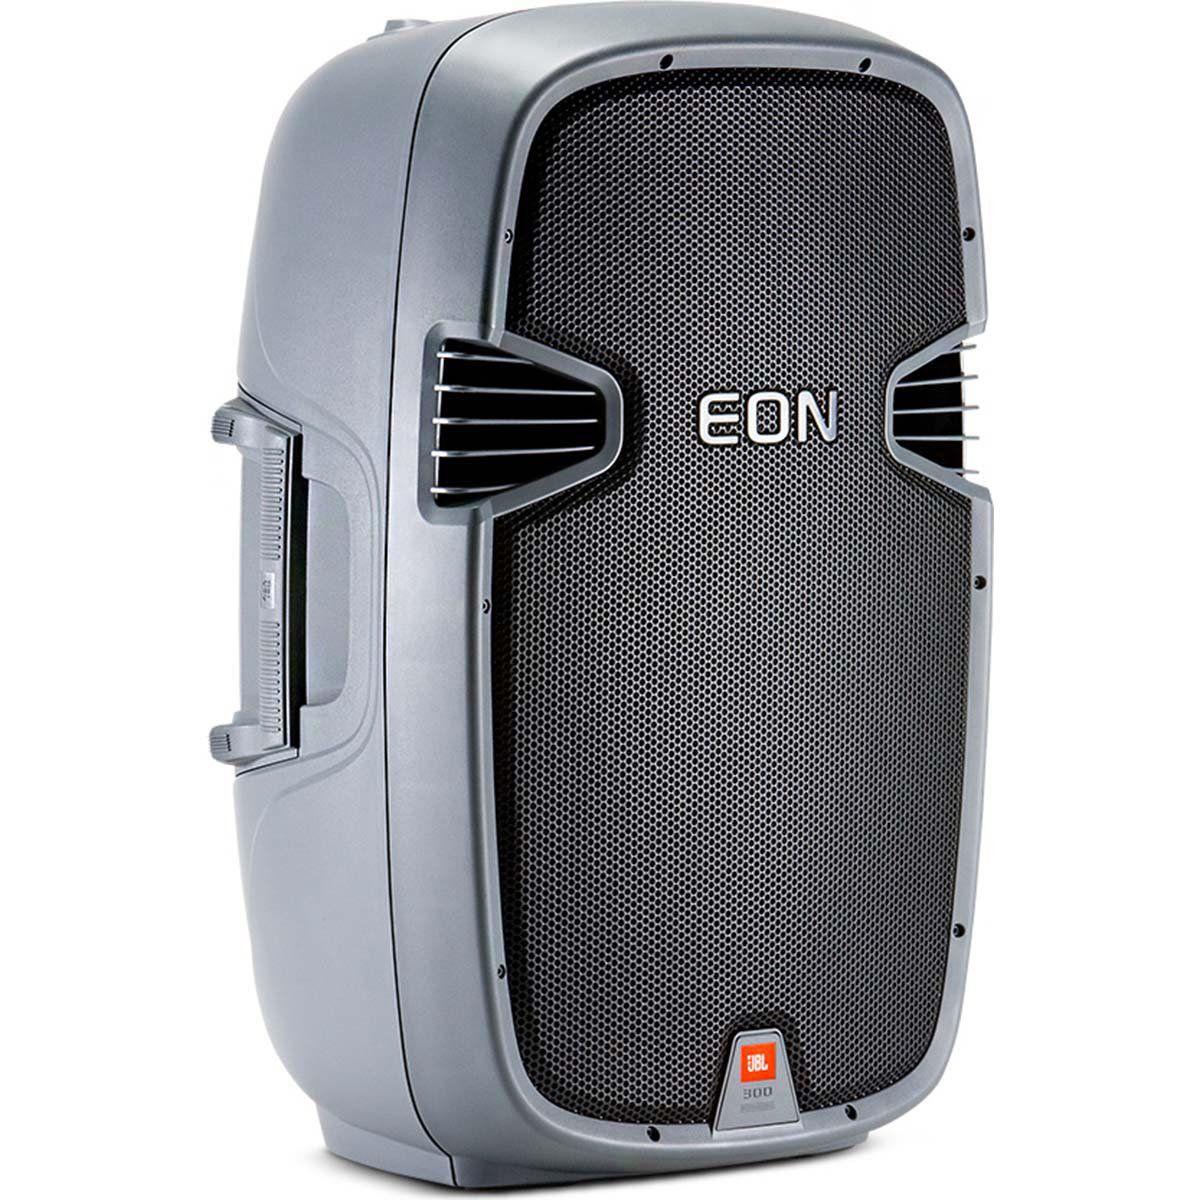 "Jbl EON 305 Caixa Passiva Jbl EON 305 15"" 250W"